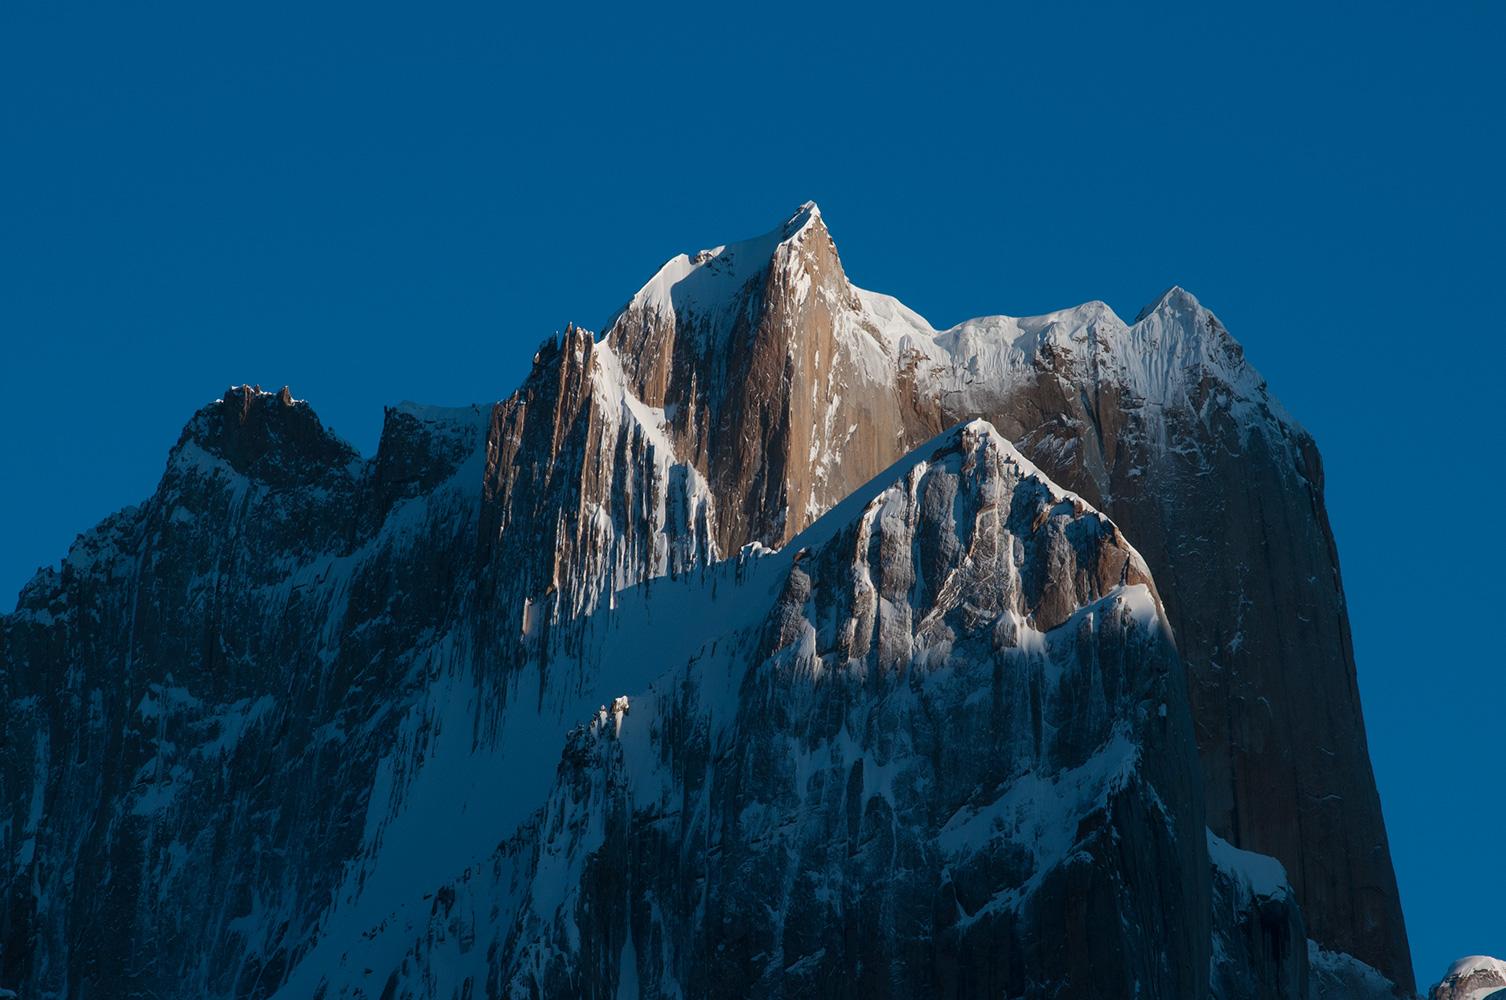 An early morning telephoto from Urdokas on the Baltoro glacier